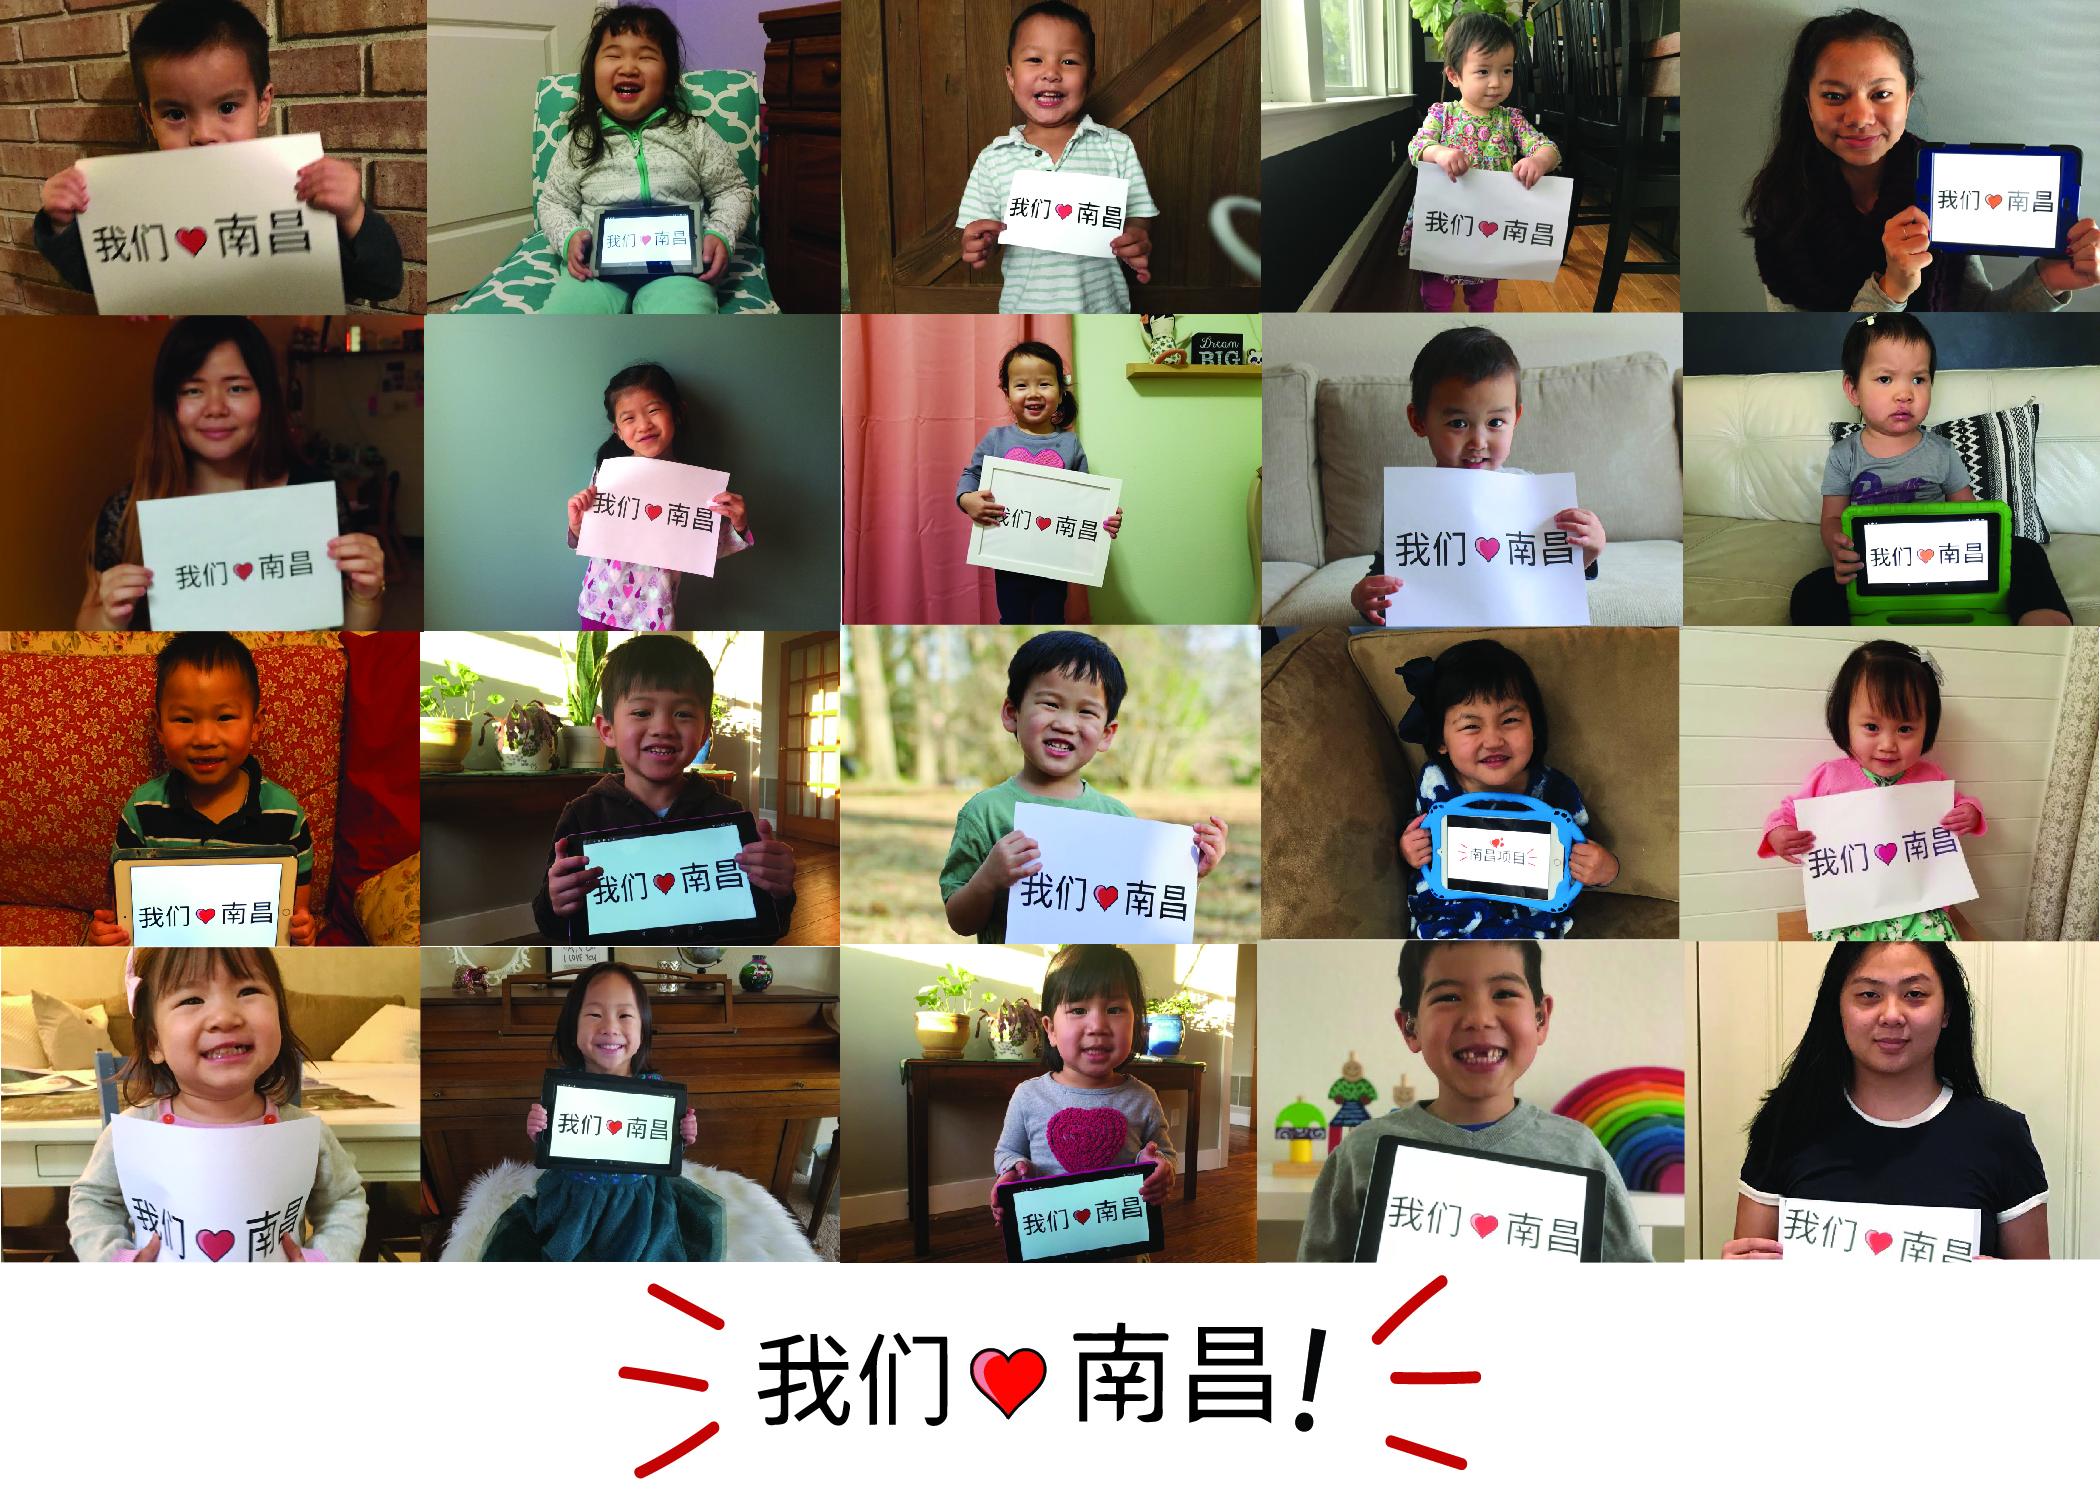 NanchangProjectCollage-01.jpg